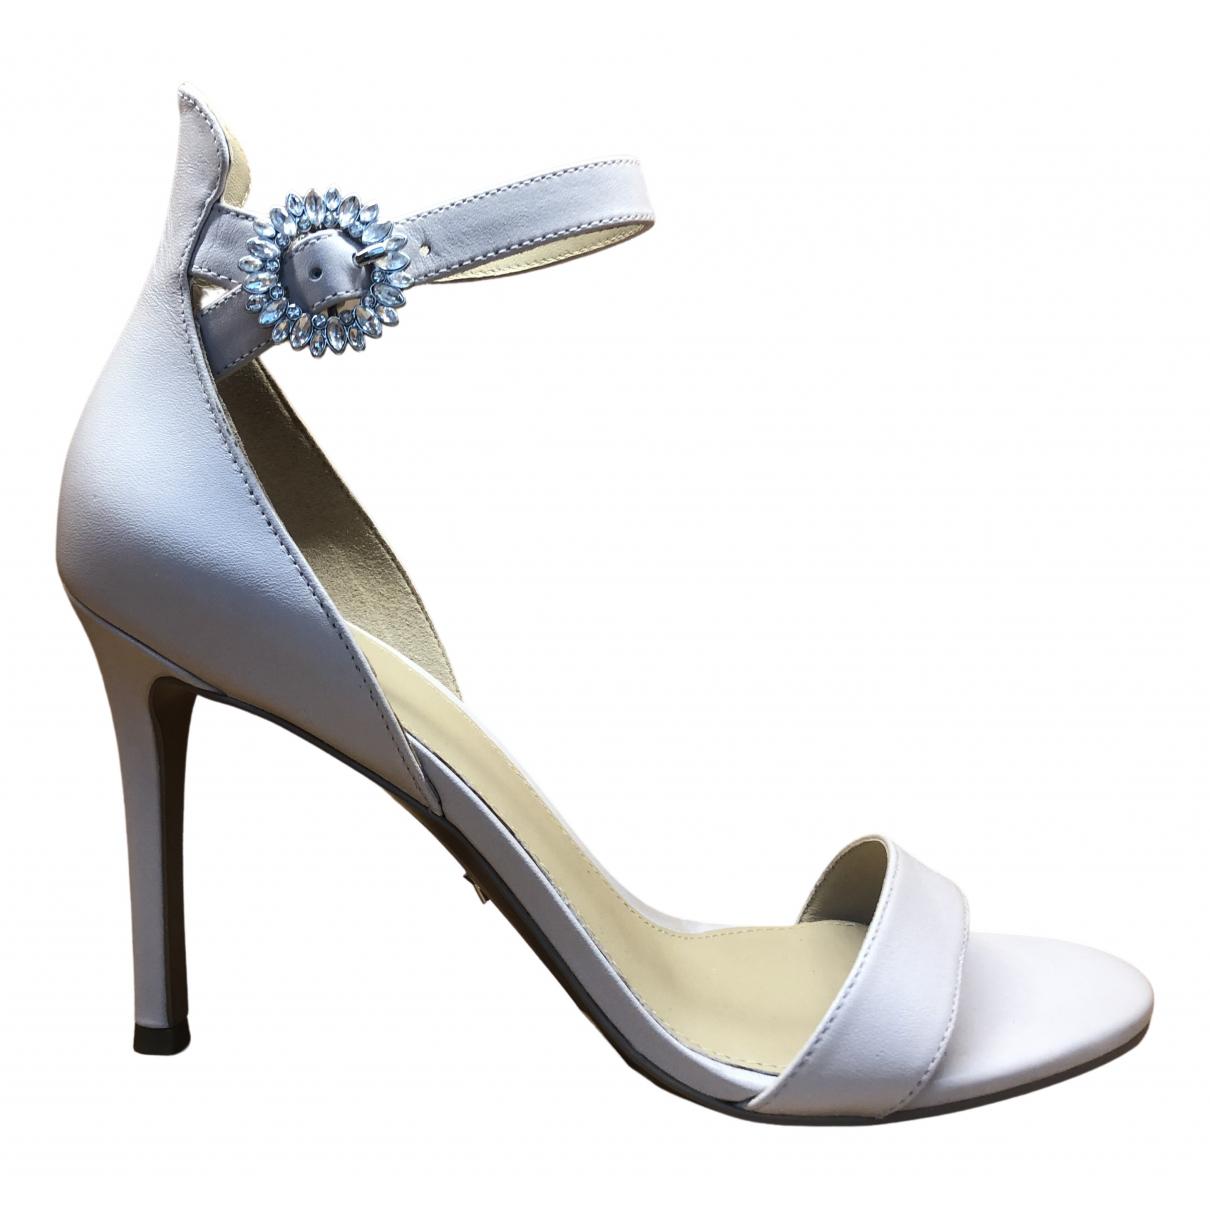 Michael Kors \N Ecru Leather Heels for Women 38 EU